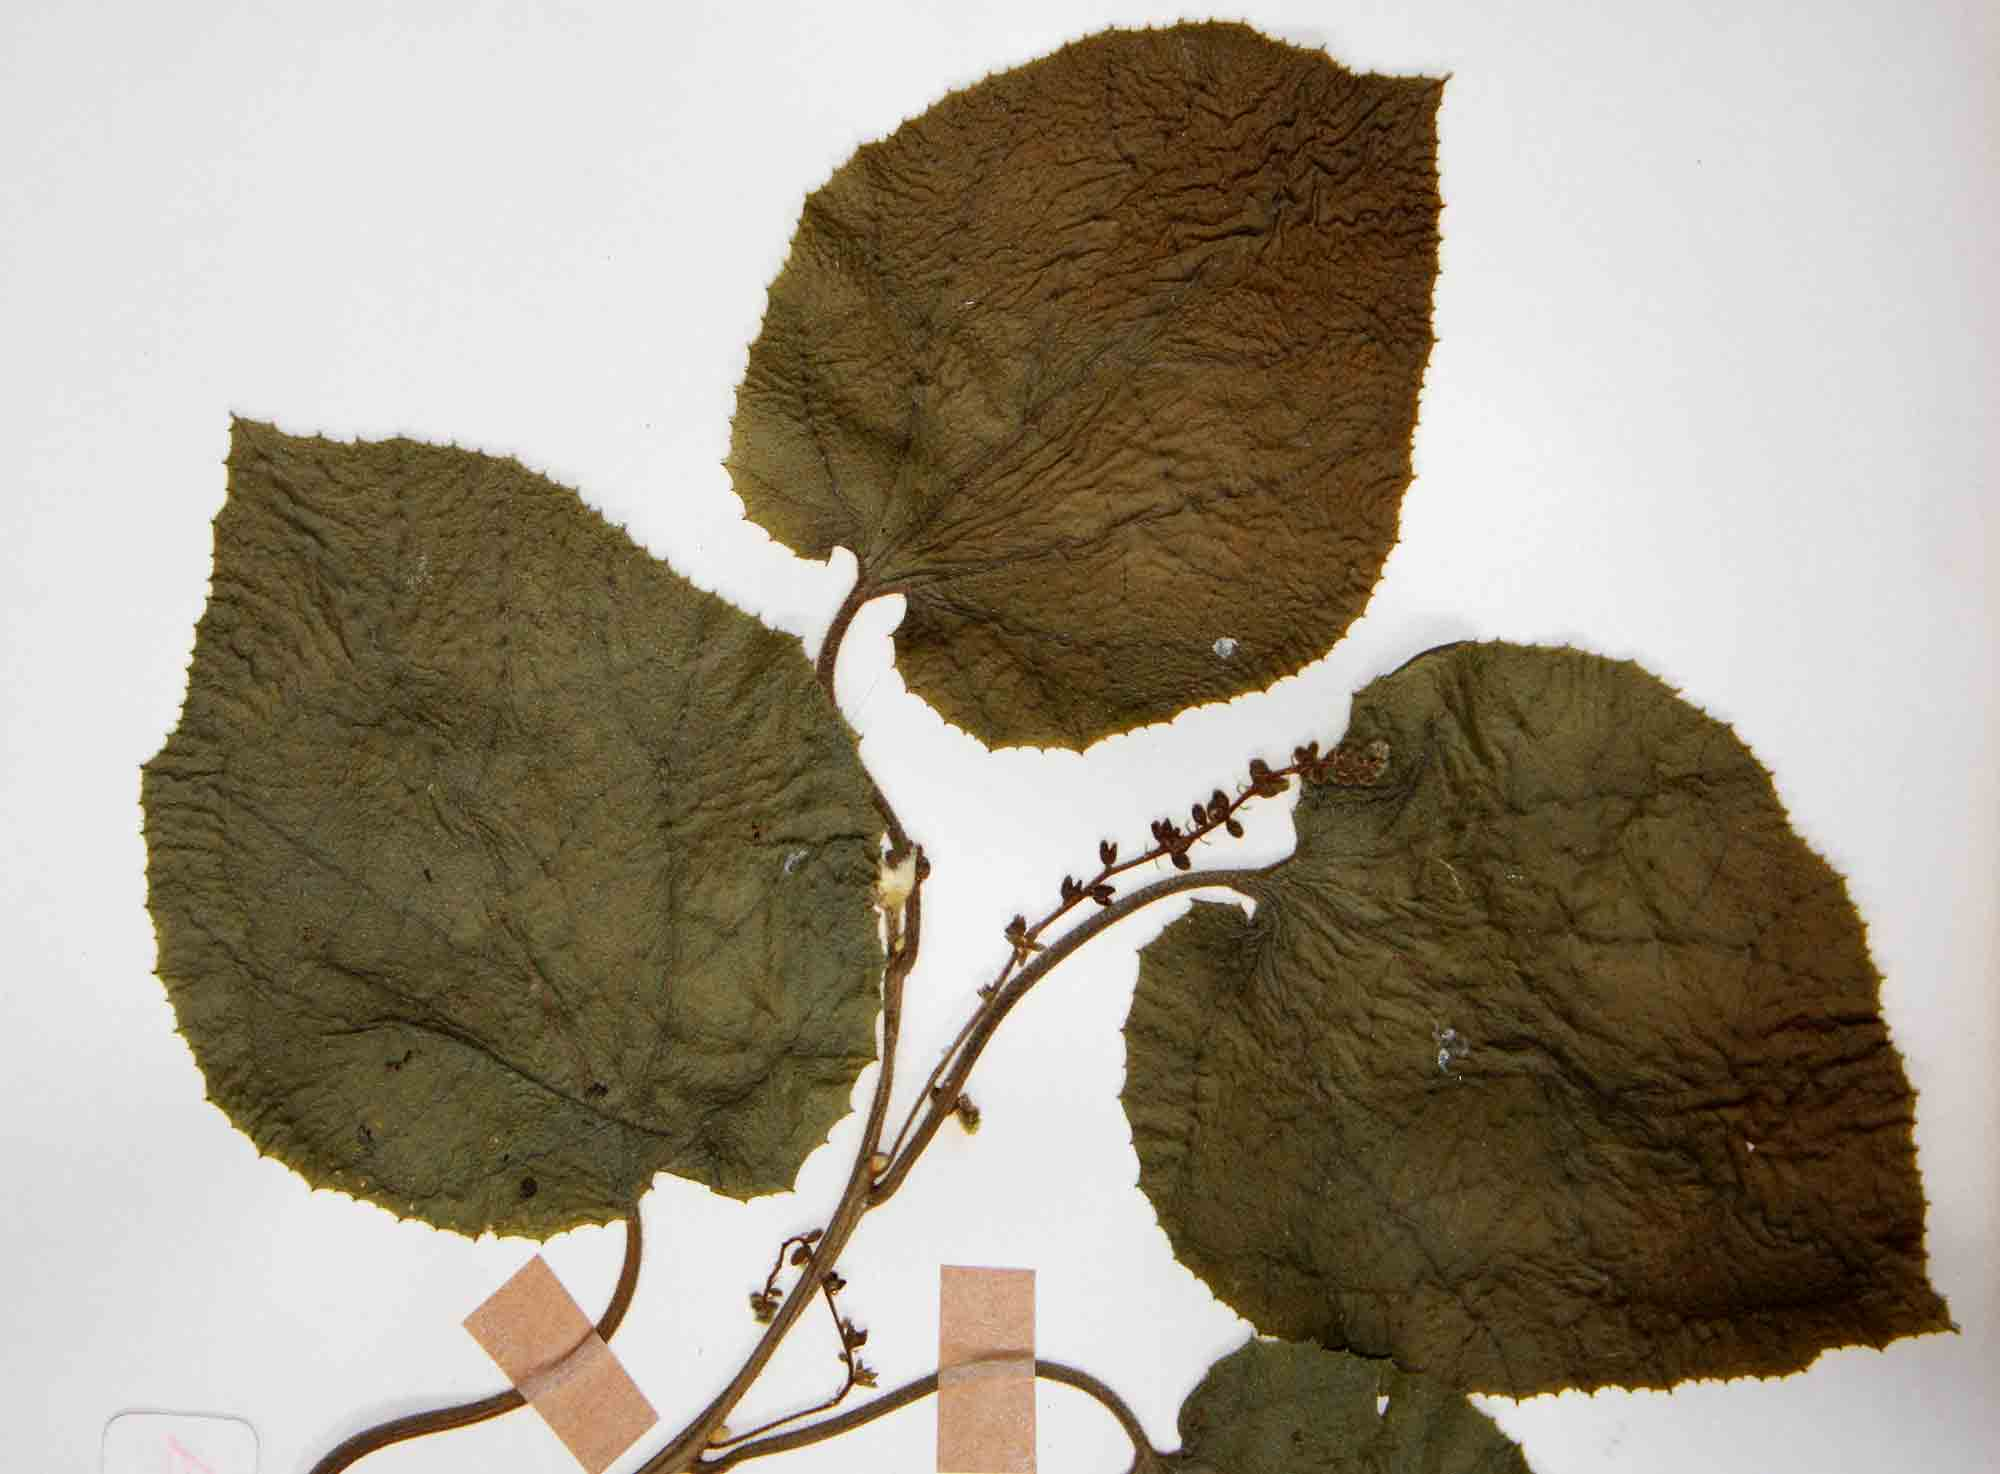 Pyrenacantha grandiflora